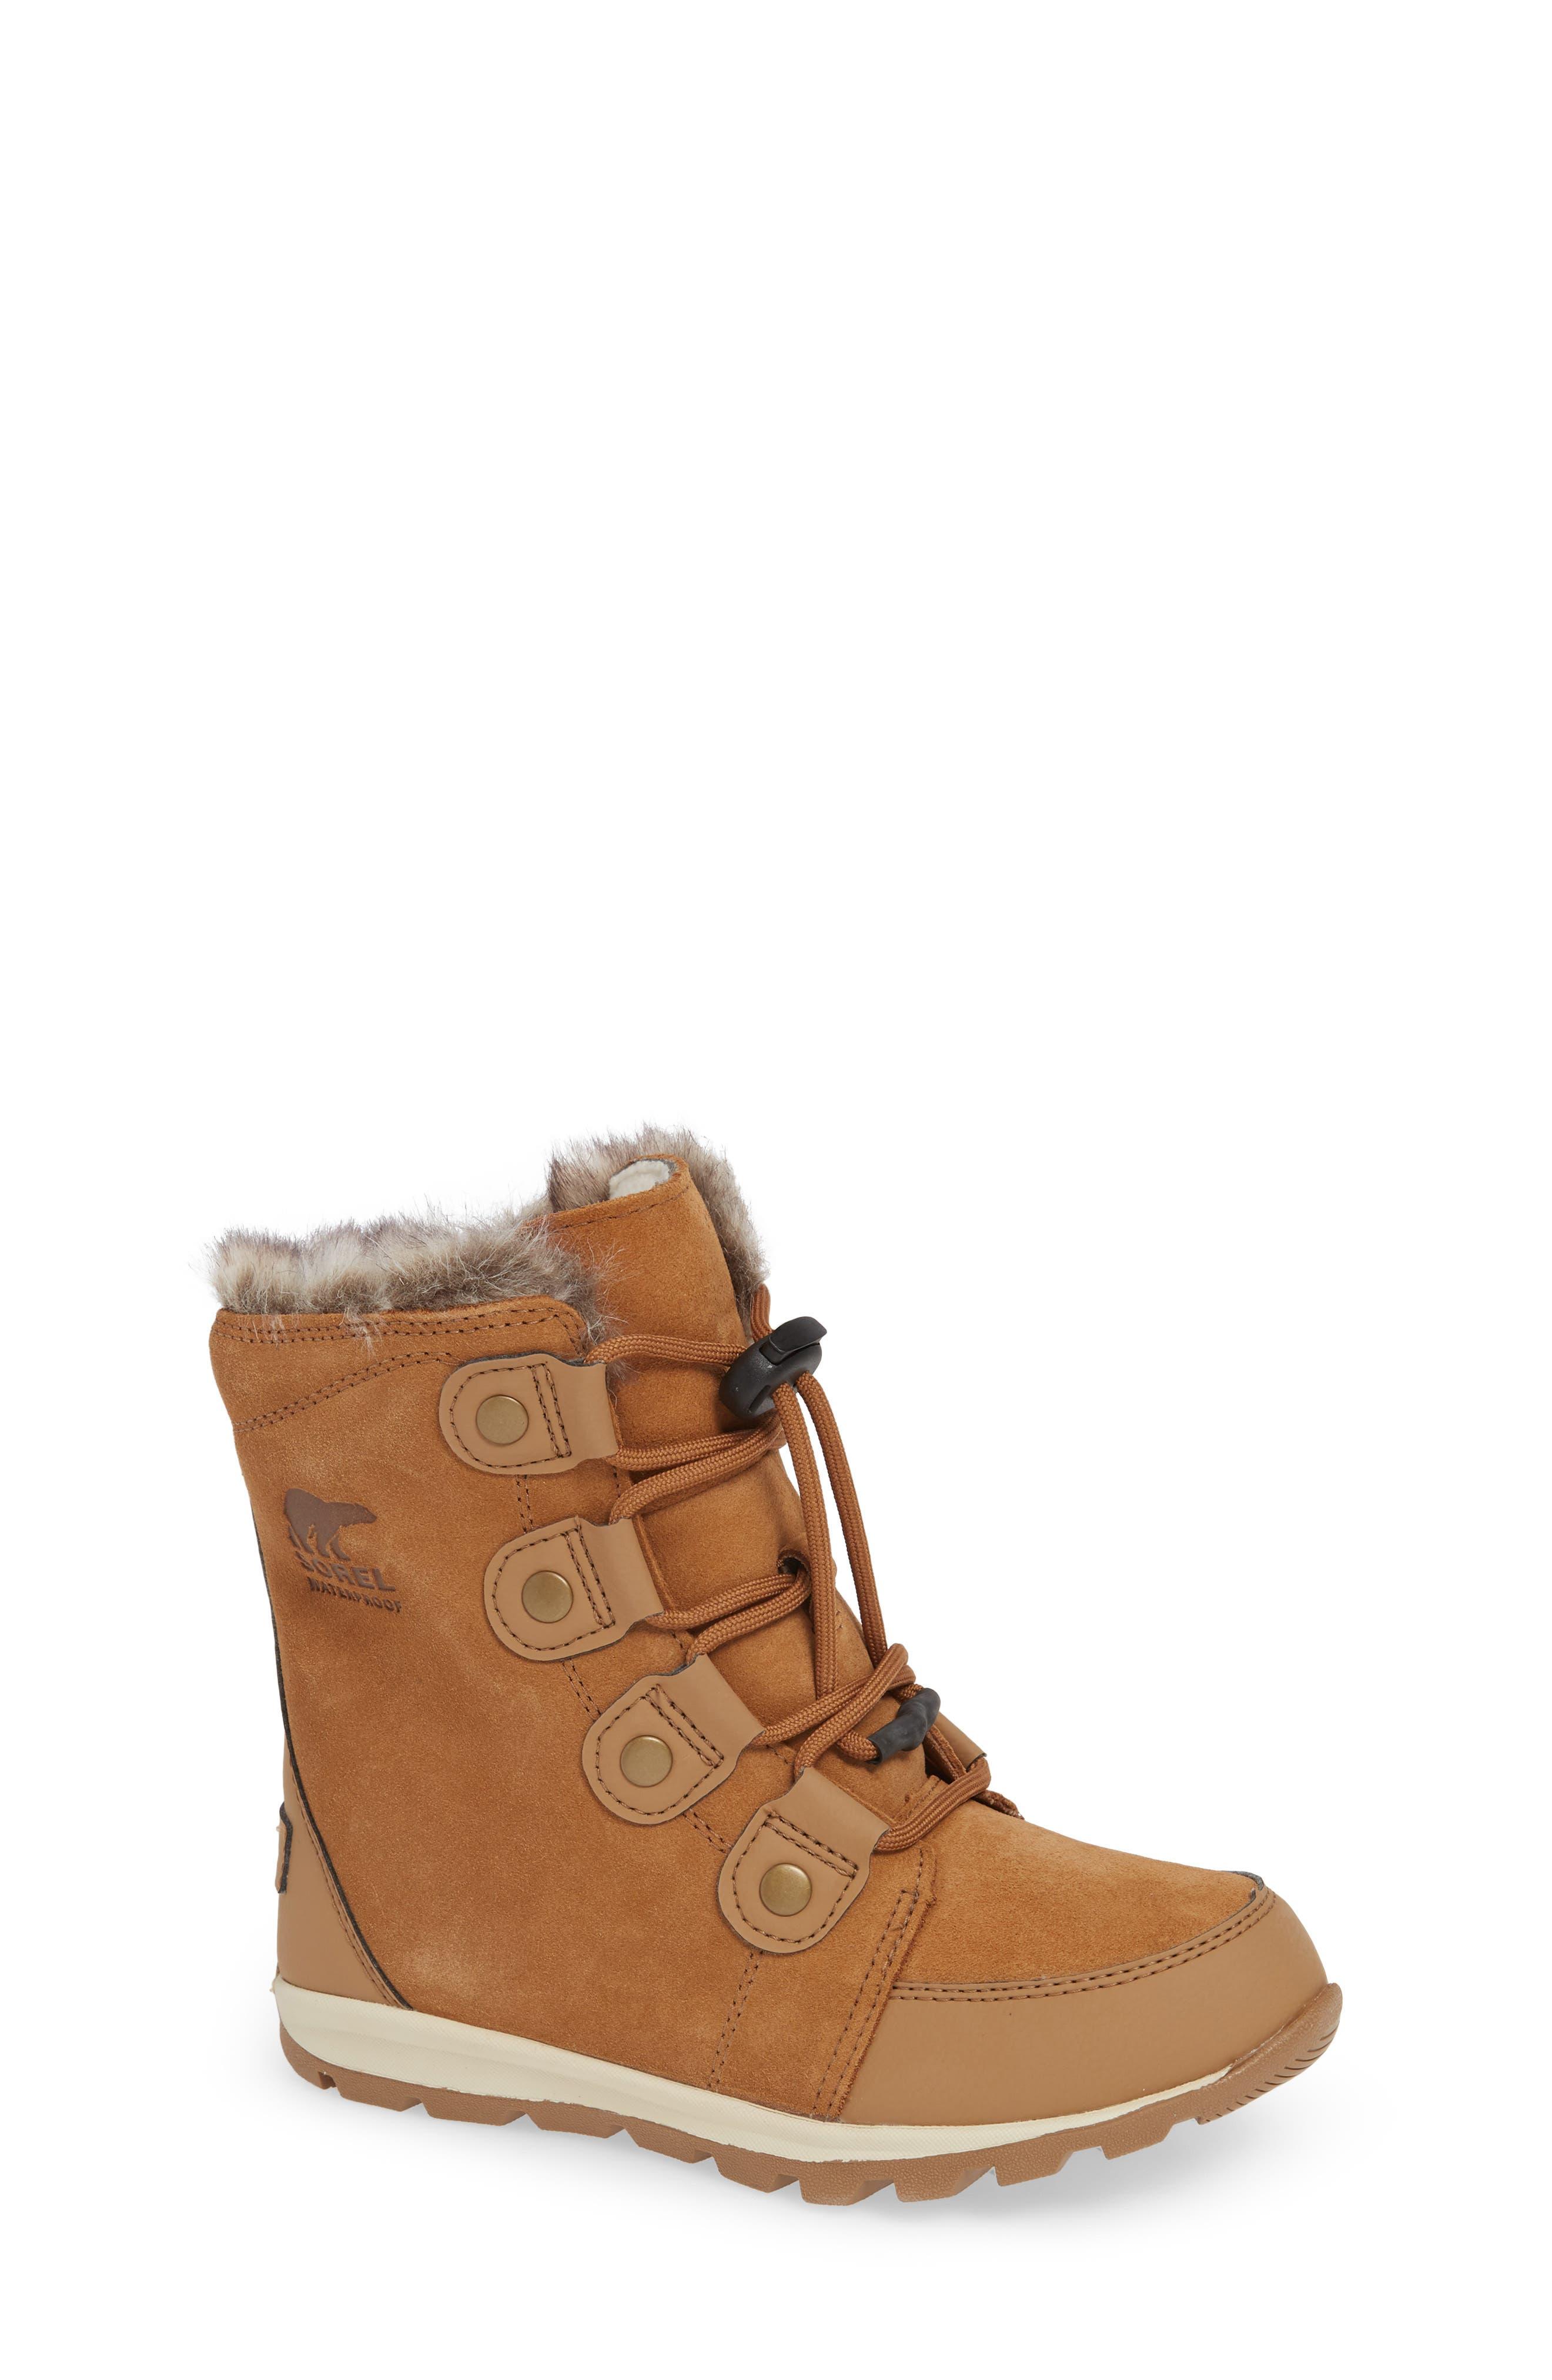 Whitney Suede Waterproof Faux Fur Boot,                         Main,                         color, ELK/ NATURAL